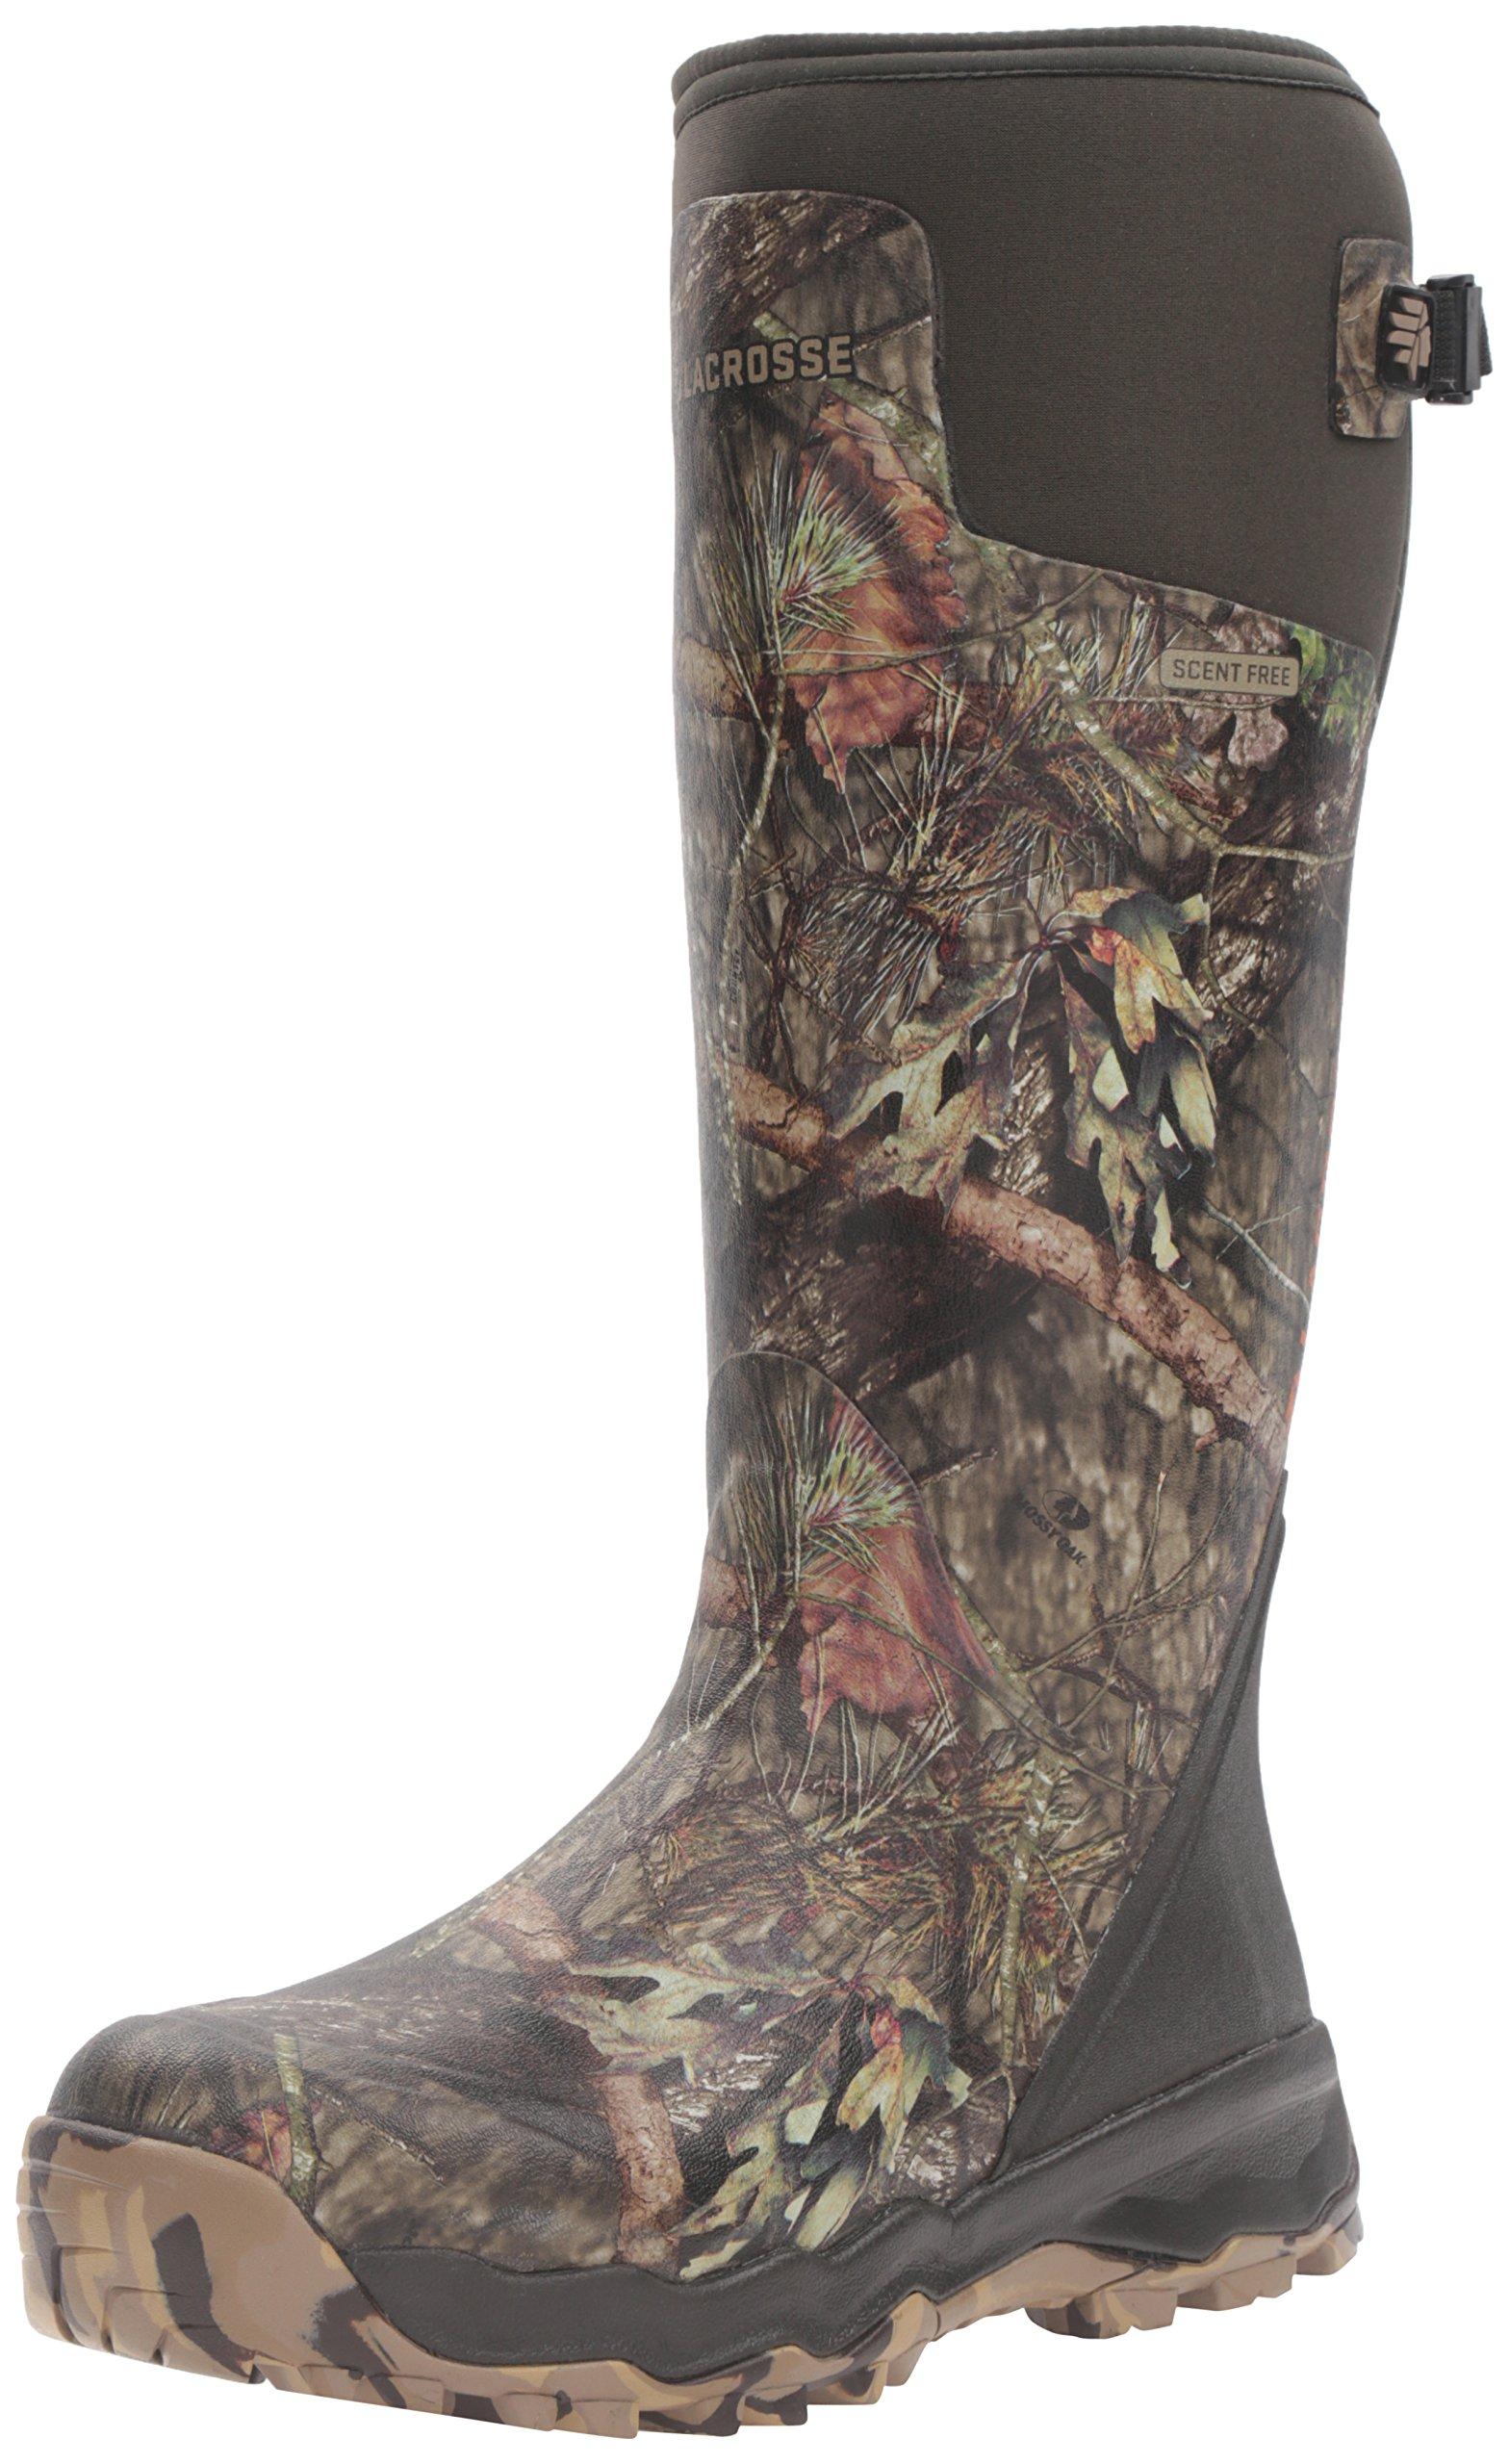 LaCrosse Men's Alphaburly Pro 18'' Hunting Shoes, Mossy Oak Break up Country, 14 M US by Lacrosse